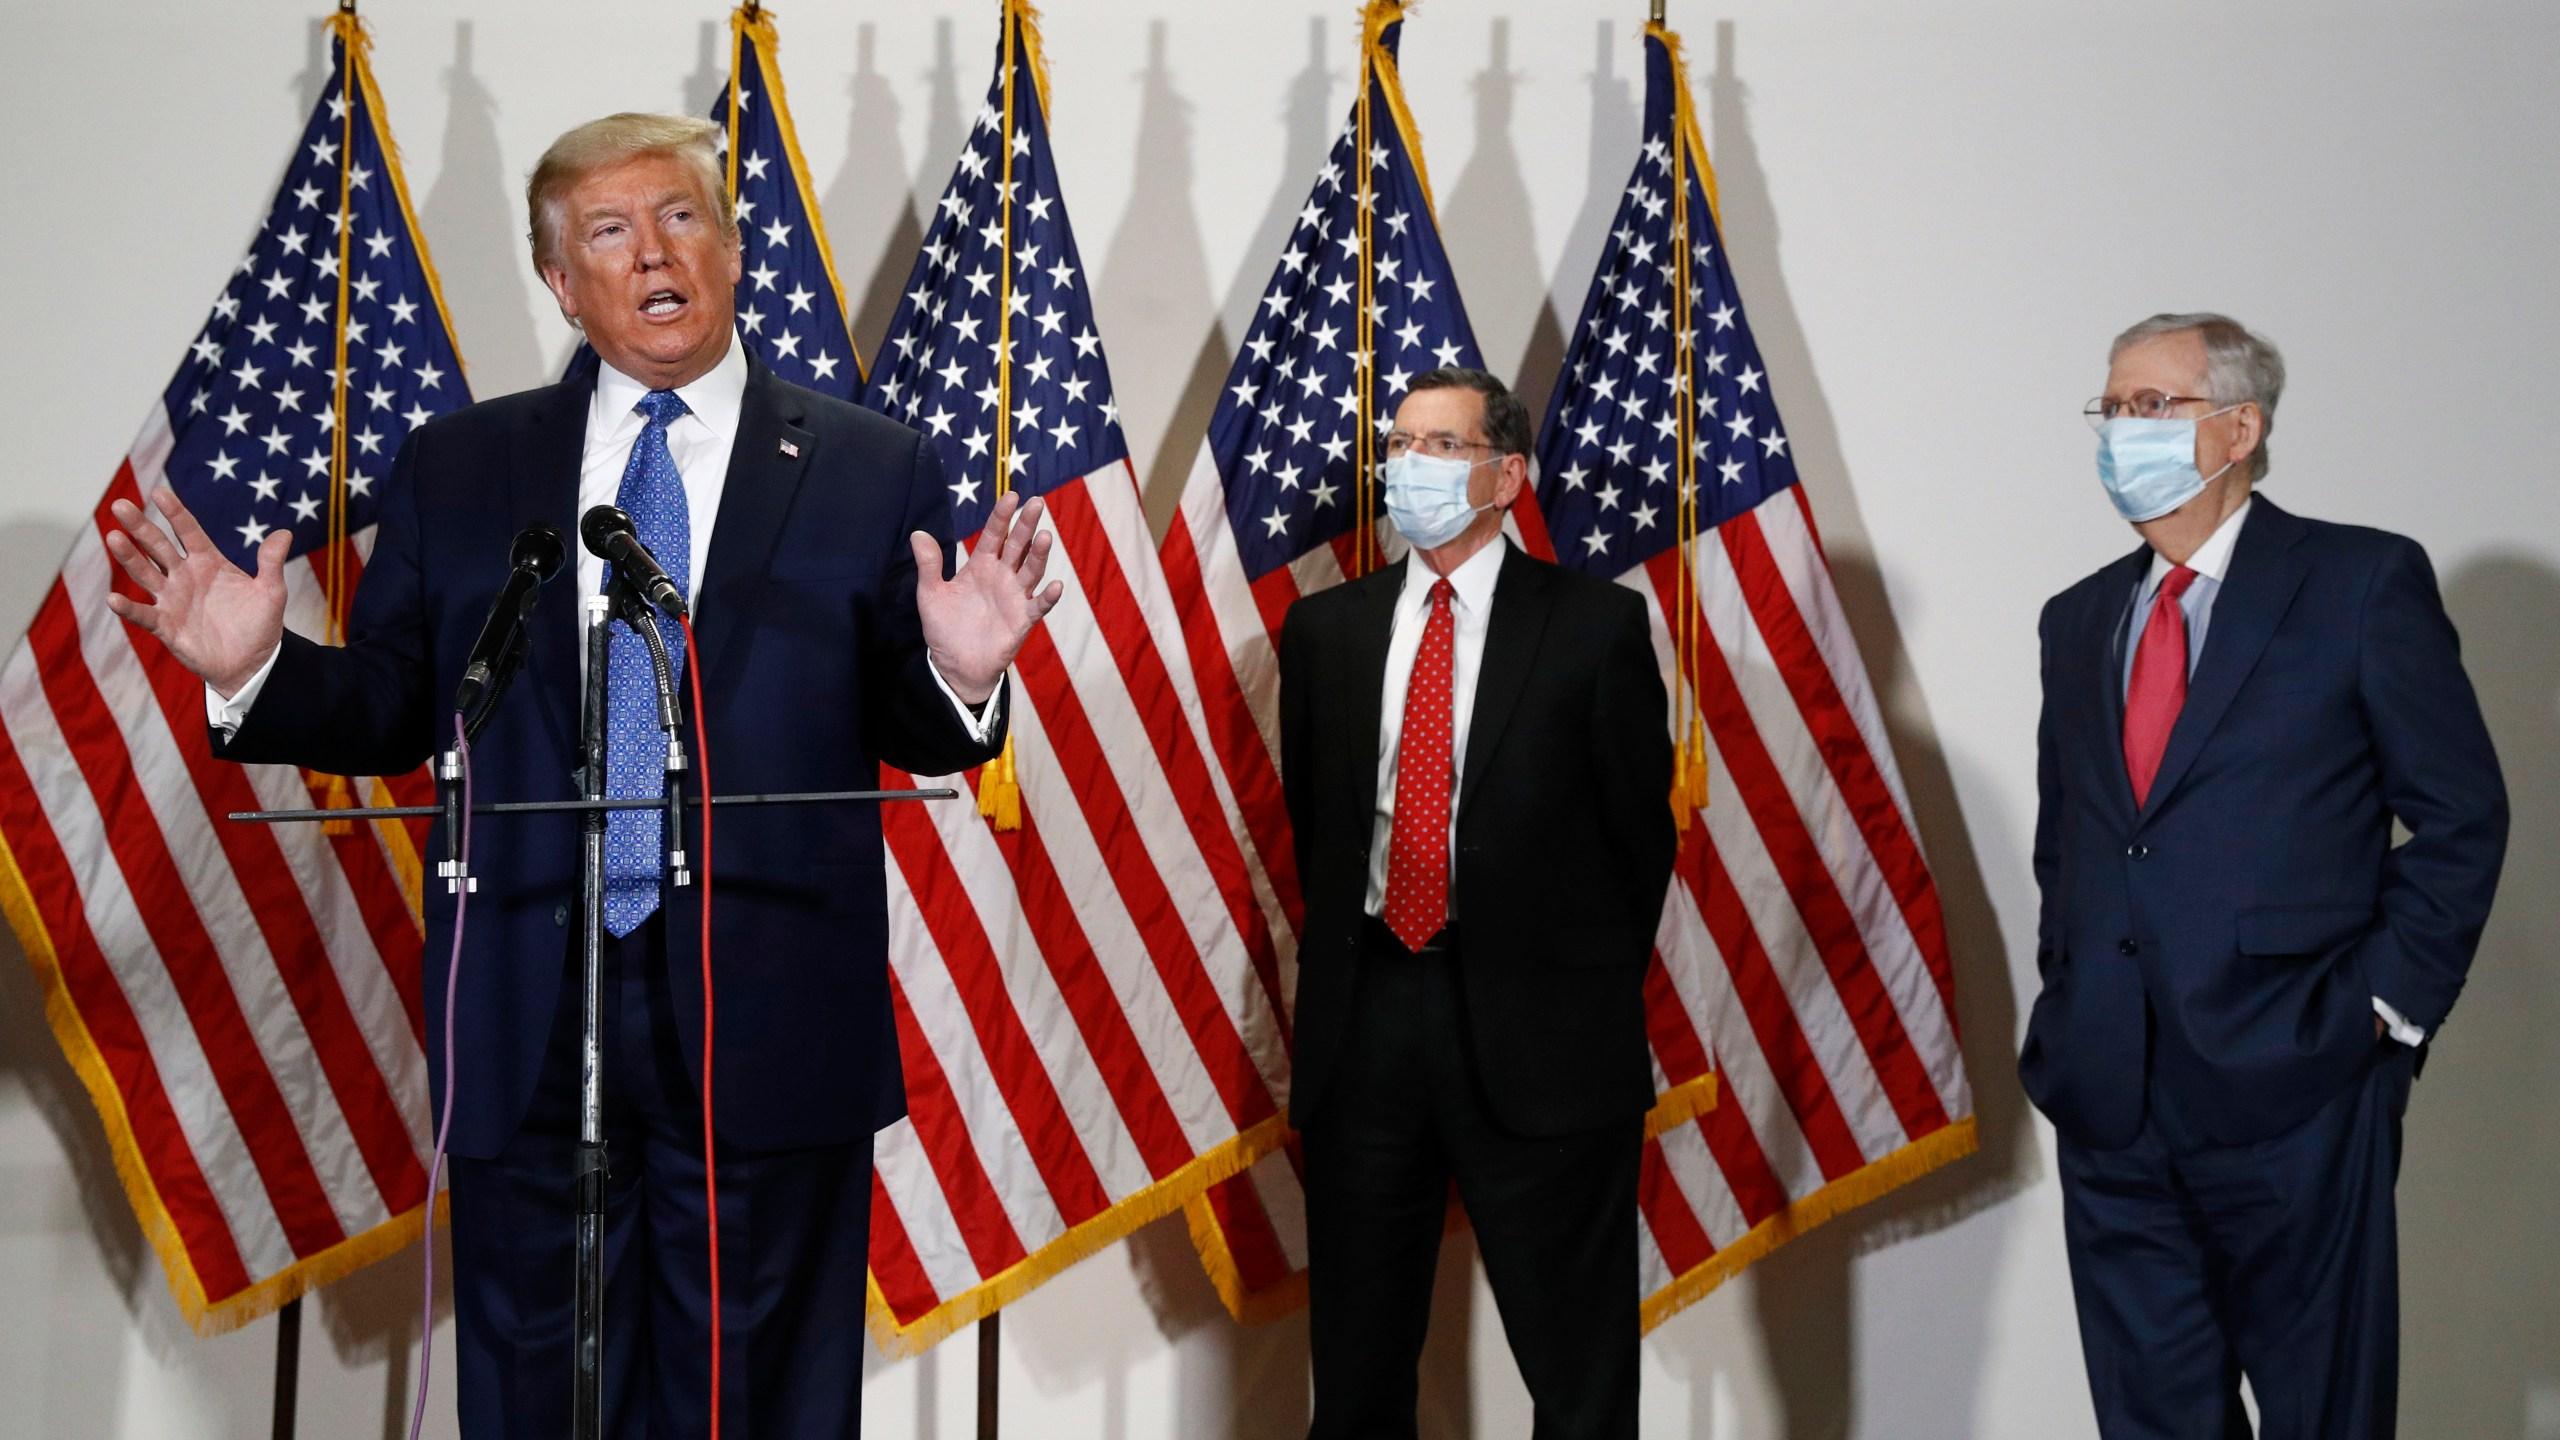 Donald Trump, John Barrasso, Mitch McConnell, Roy Blunt